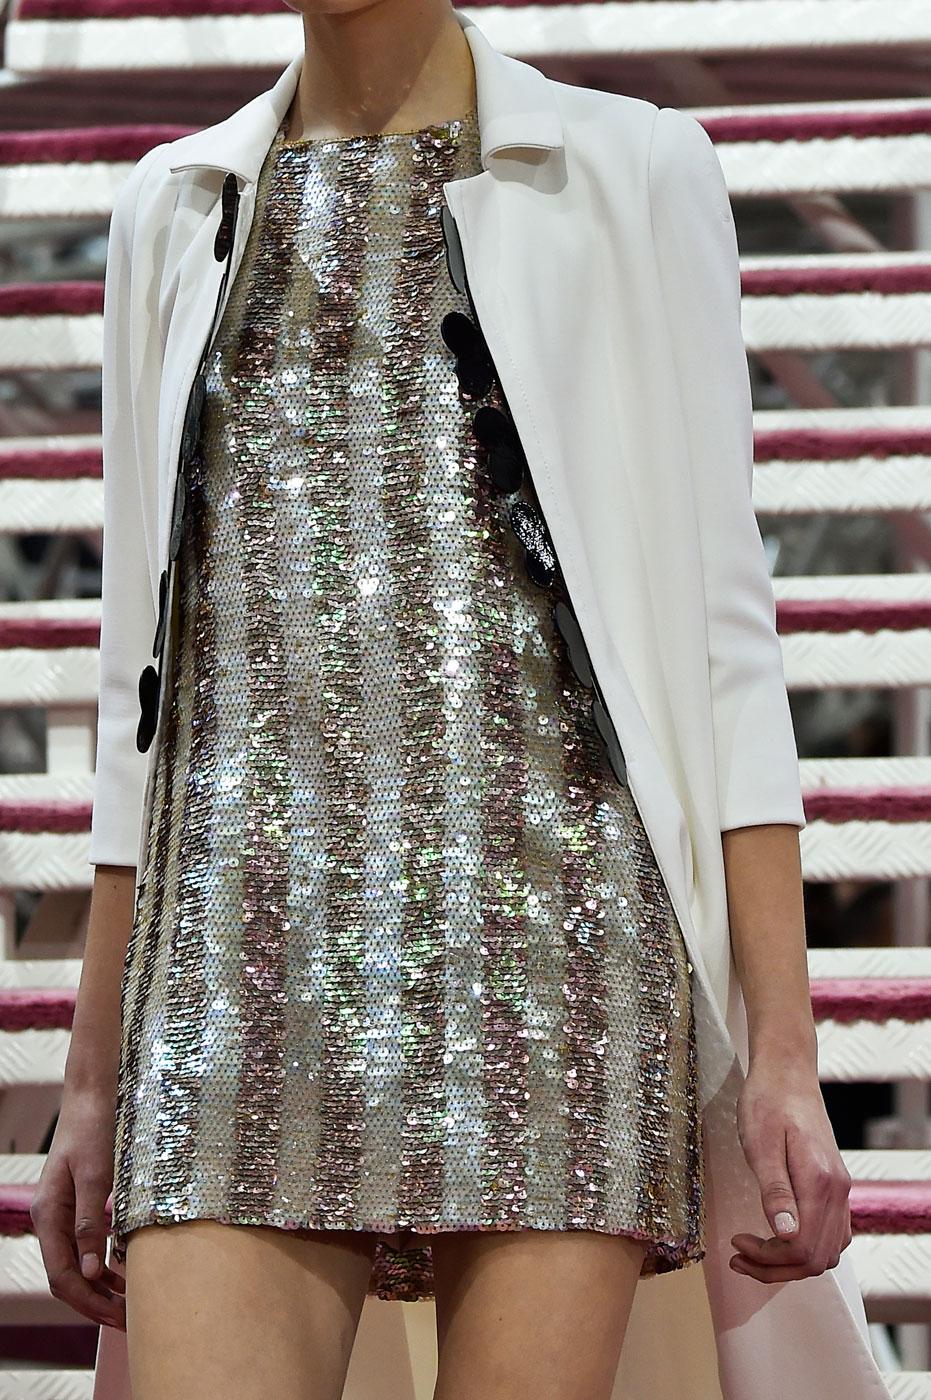 Christian-Dior-fashion-runway-show-close-ups-haute-couture-paris-spring-summer-2015-the-impression-116